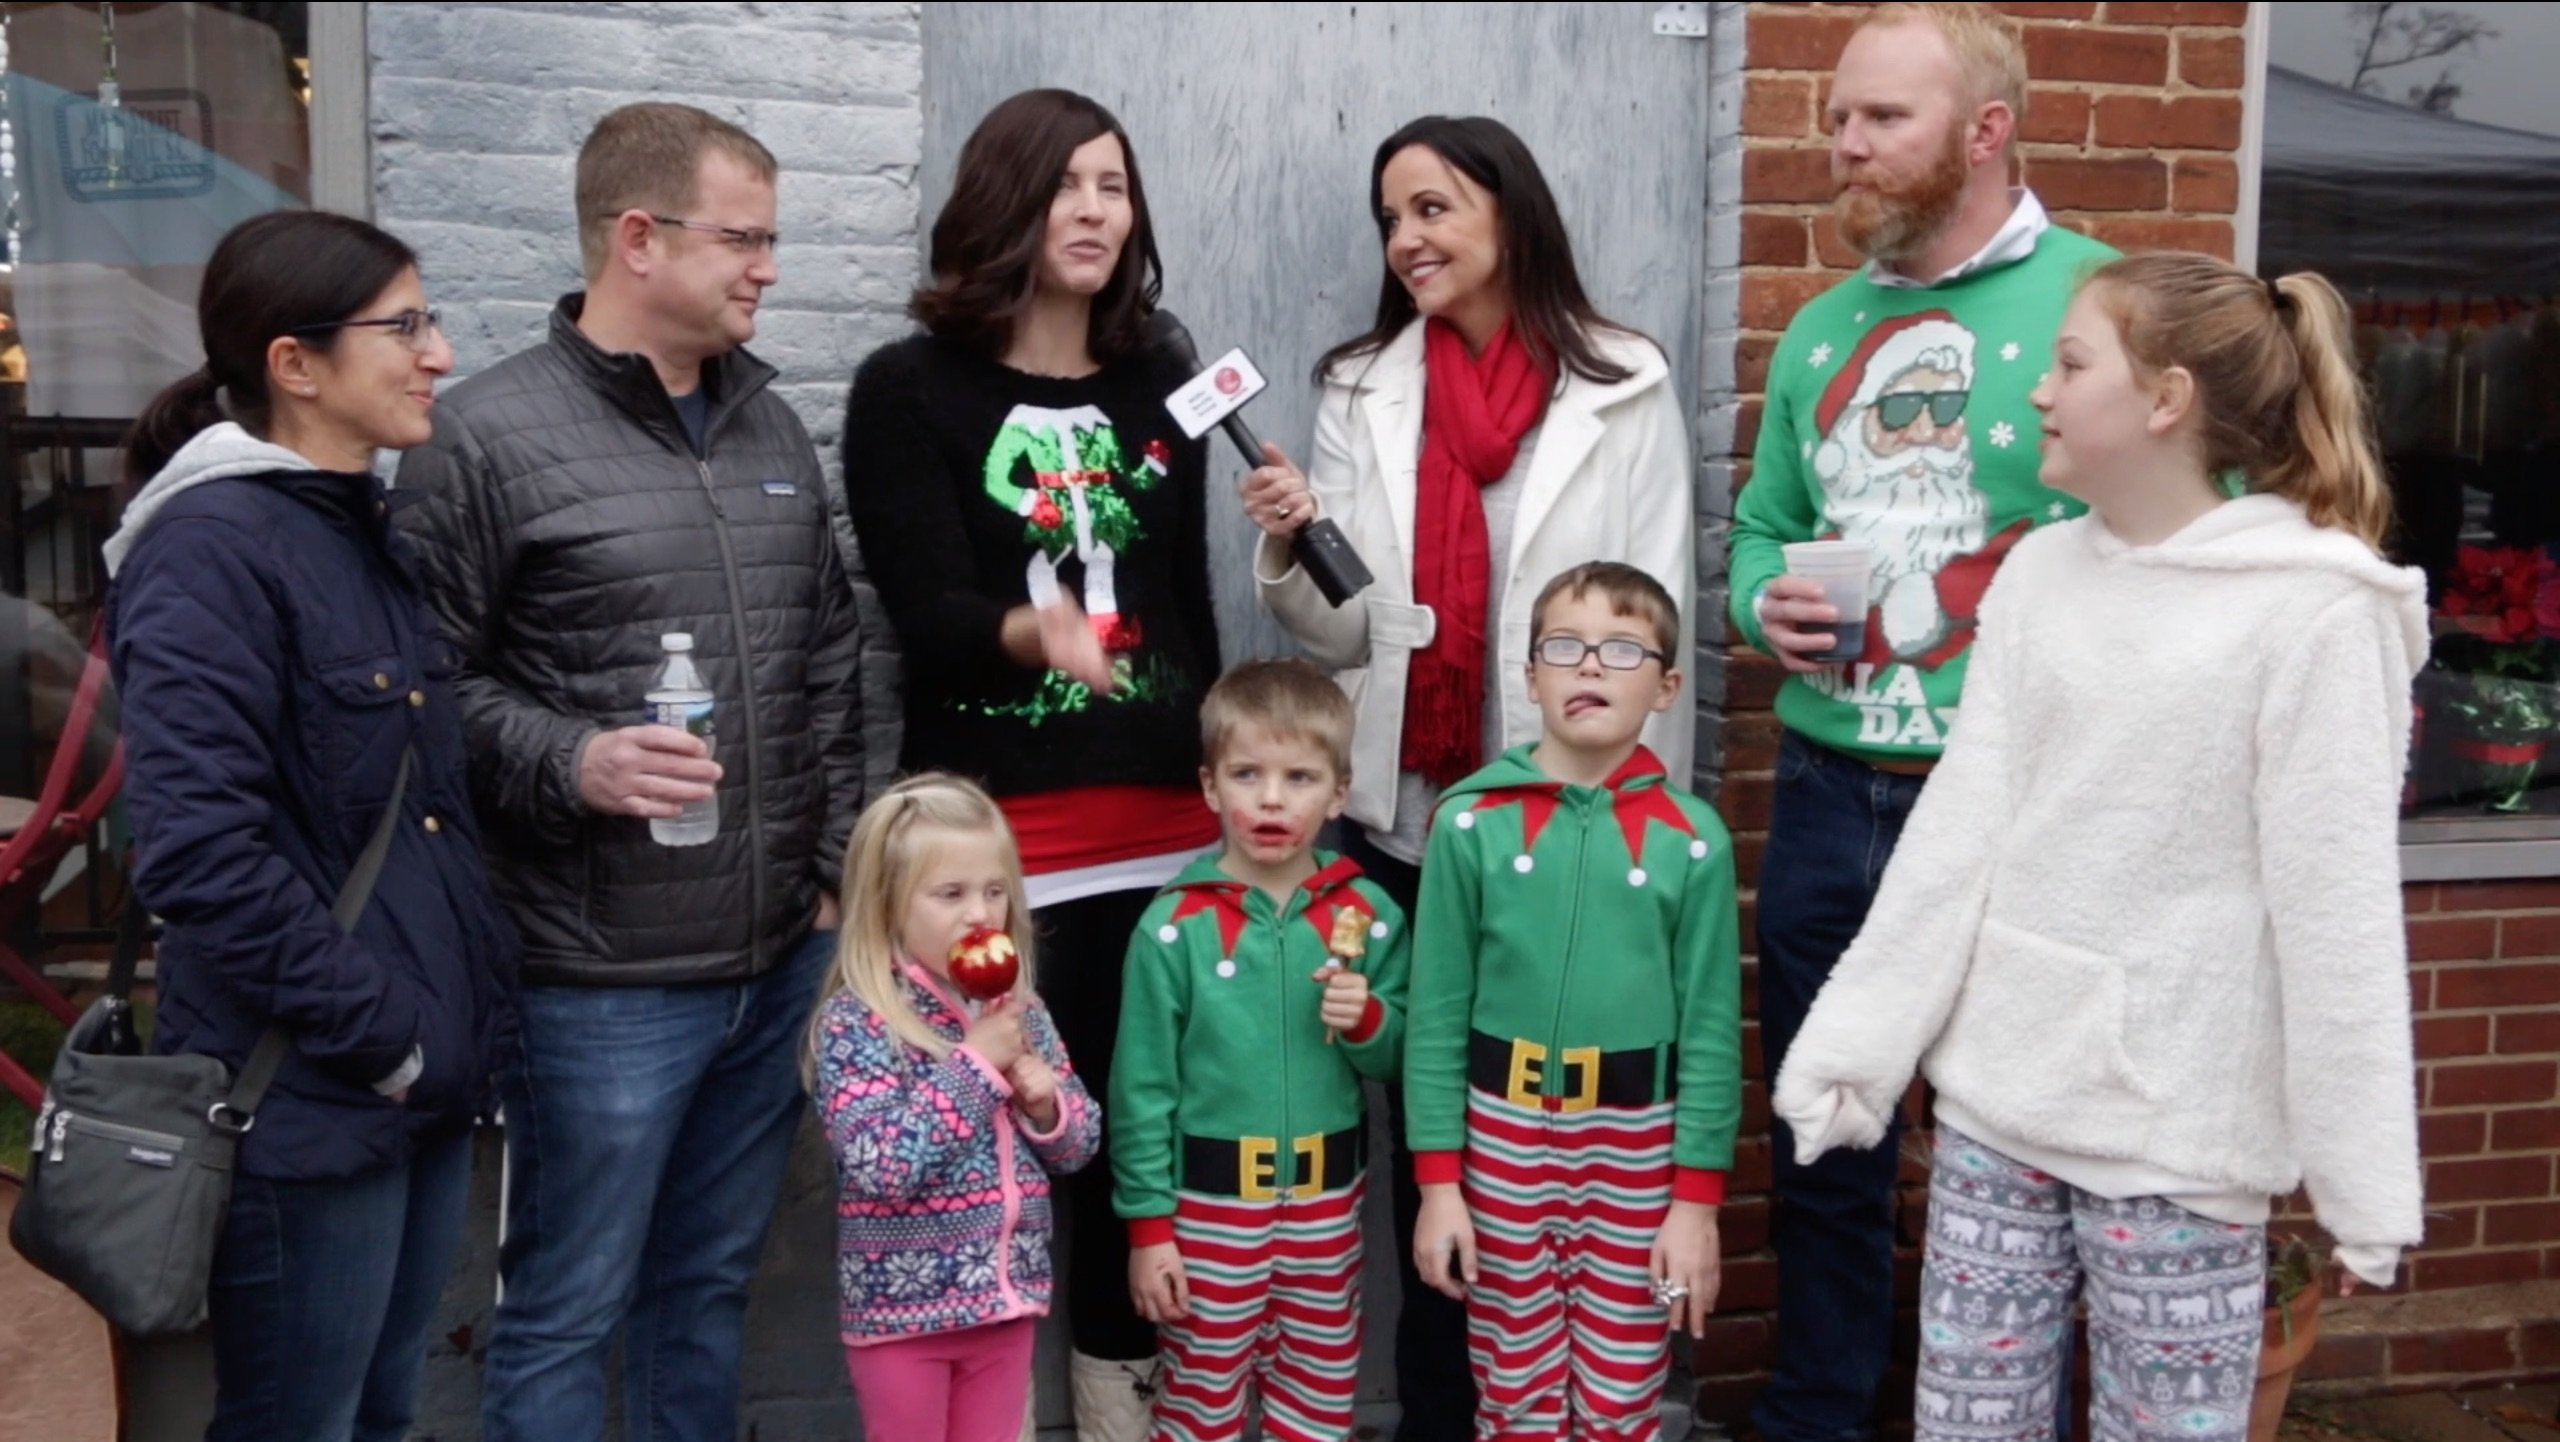 Jingle Jam Main Street Fort Mill crowd